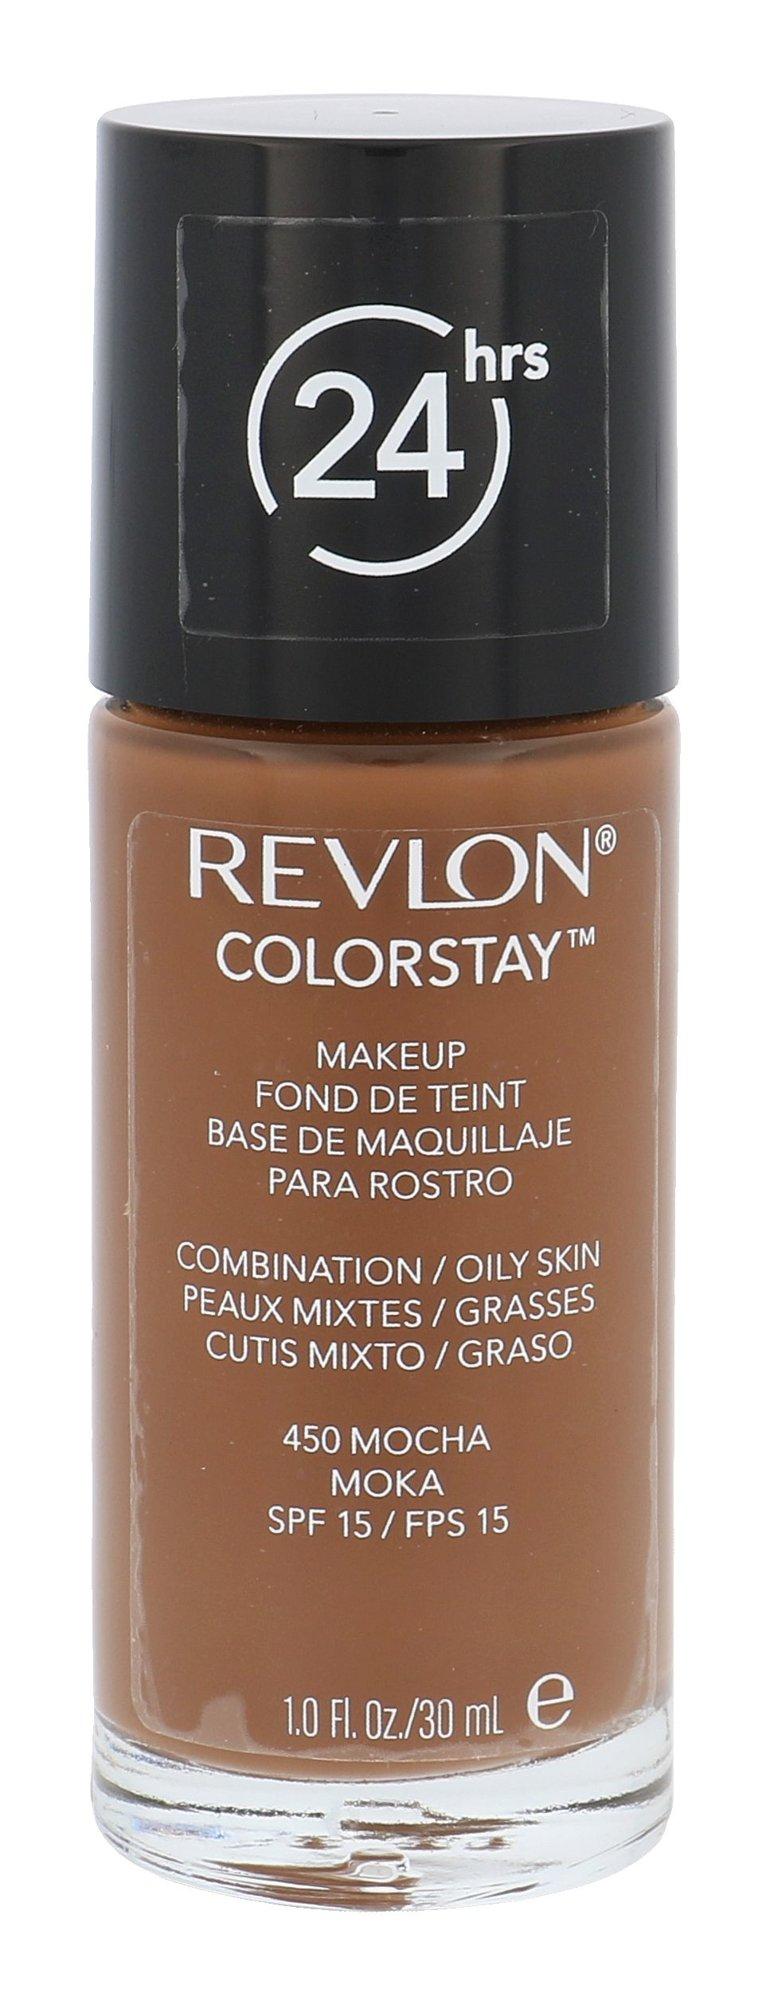 Revlon Colorstay Cosmetic 30ml 450 Mocha